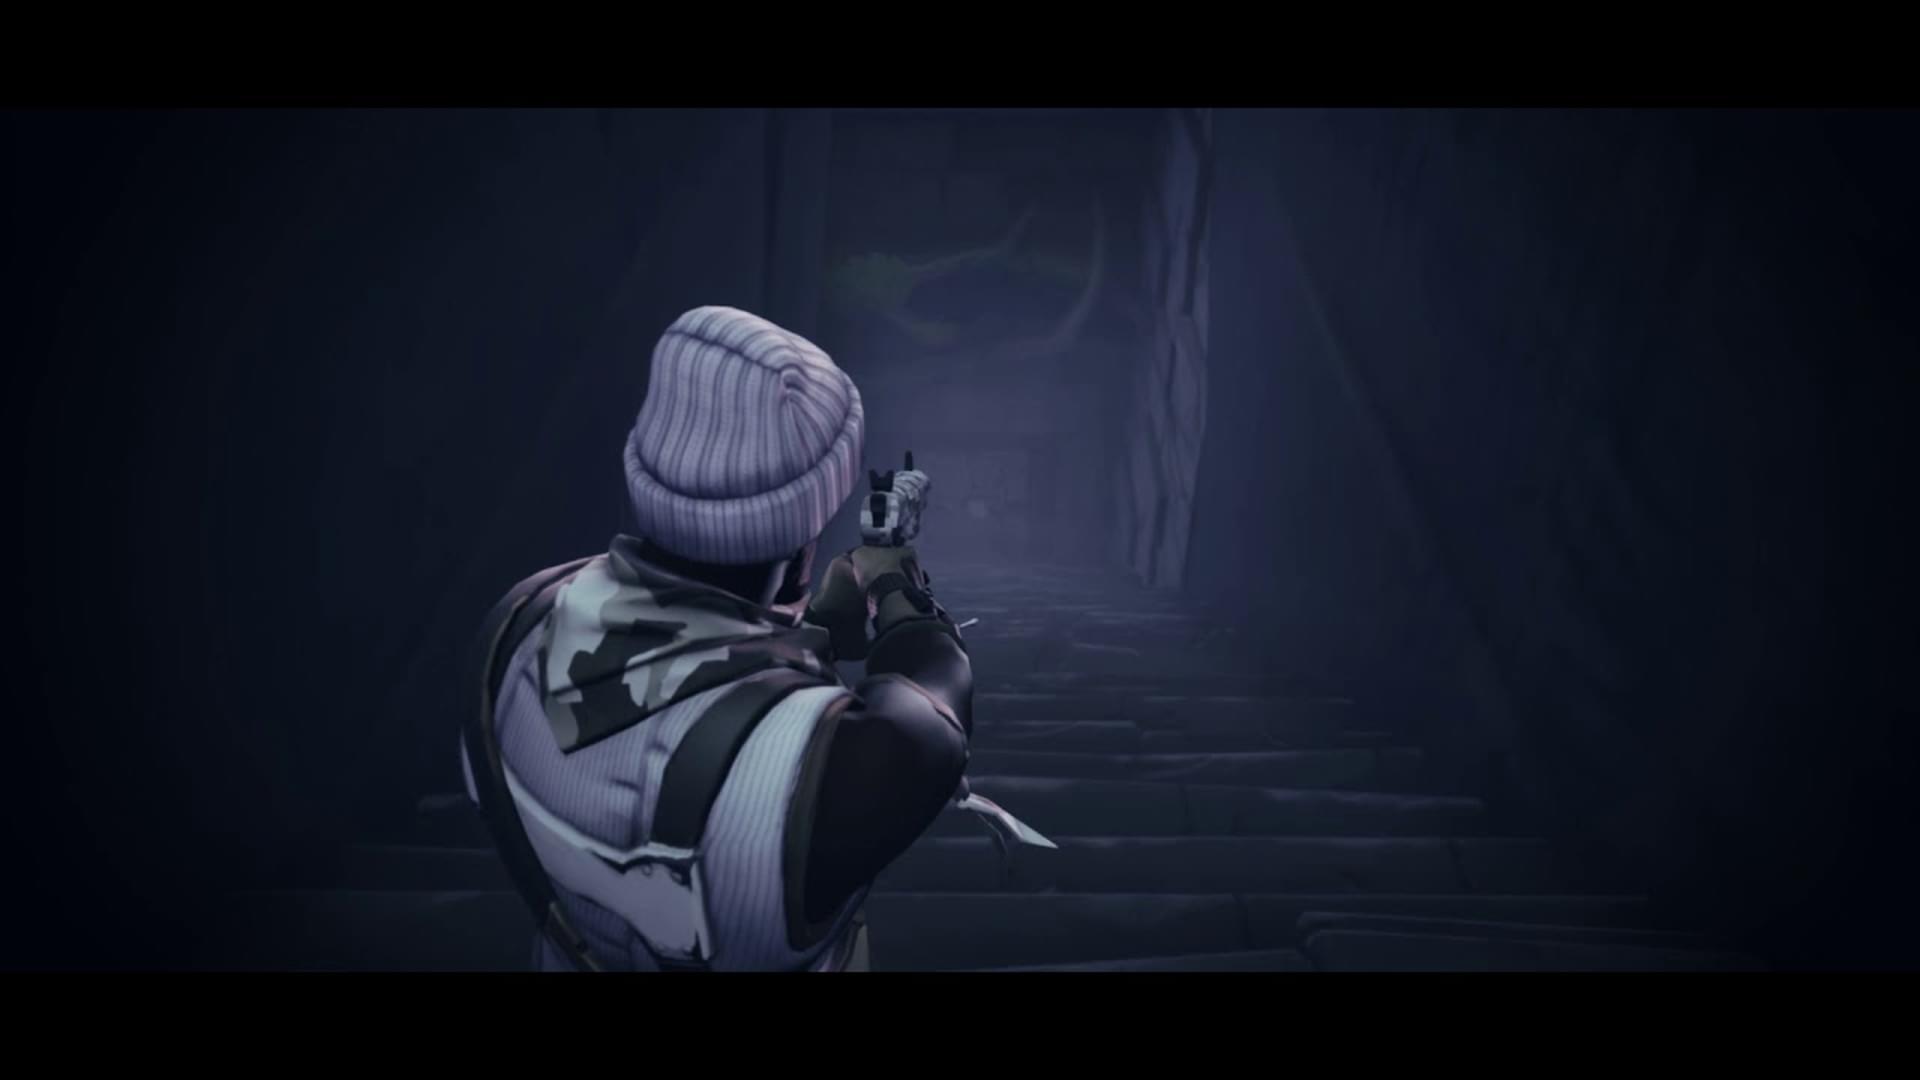 Fortnite Creative Survival Horror Spencer Mansion By Kryw